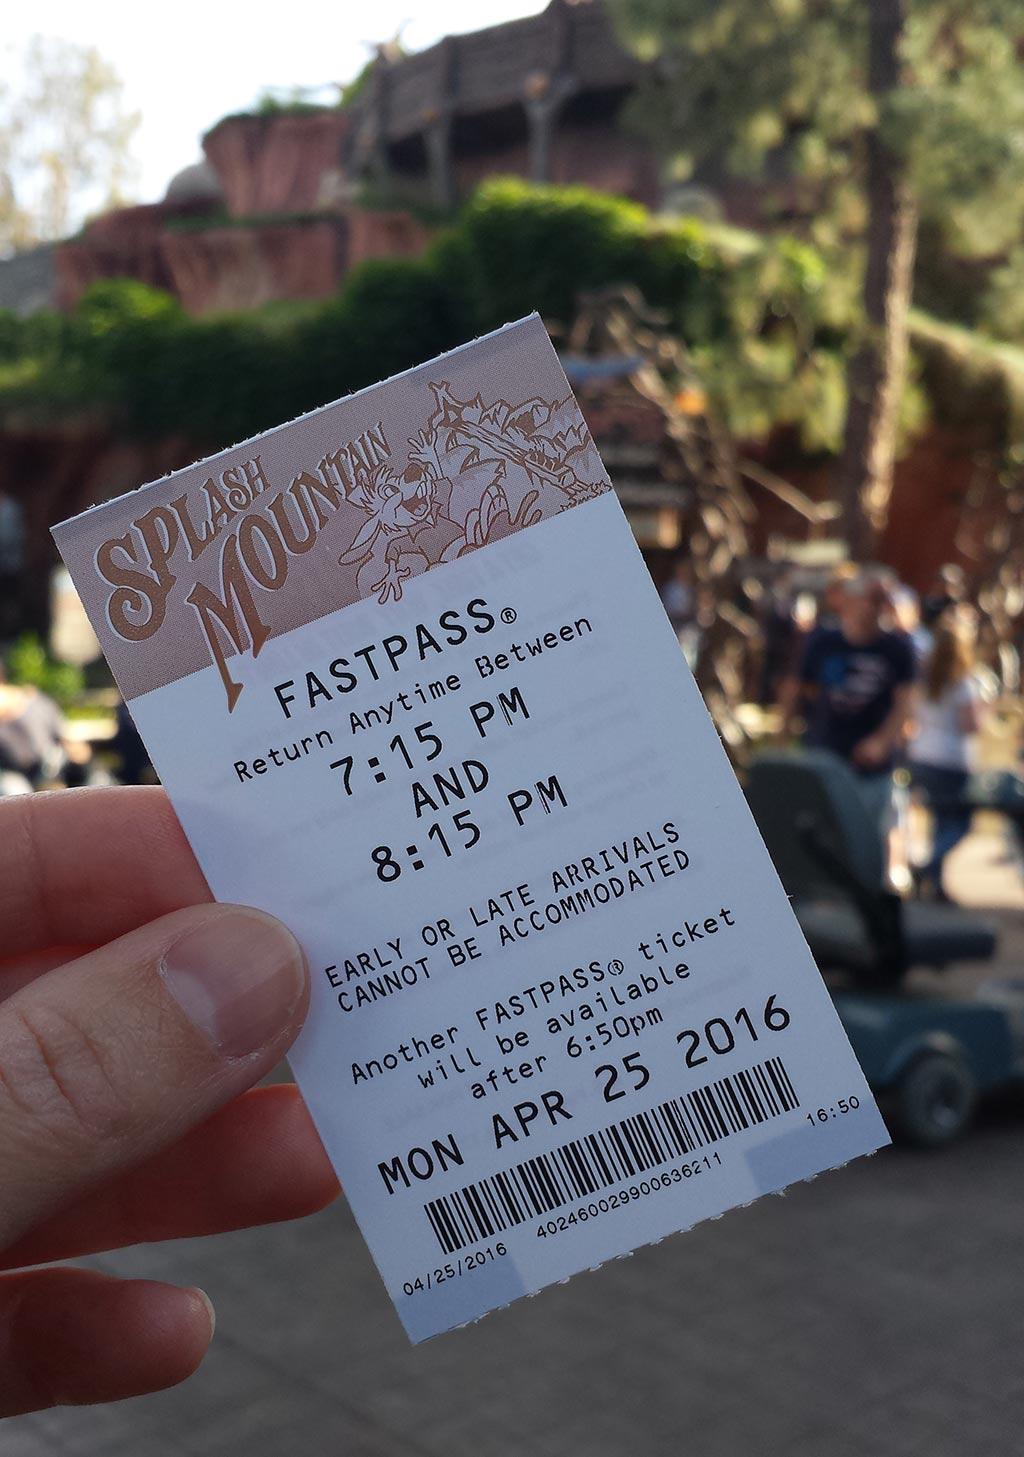 Splash Mountain Fastpass Disneyland California